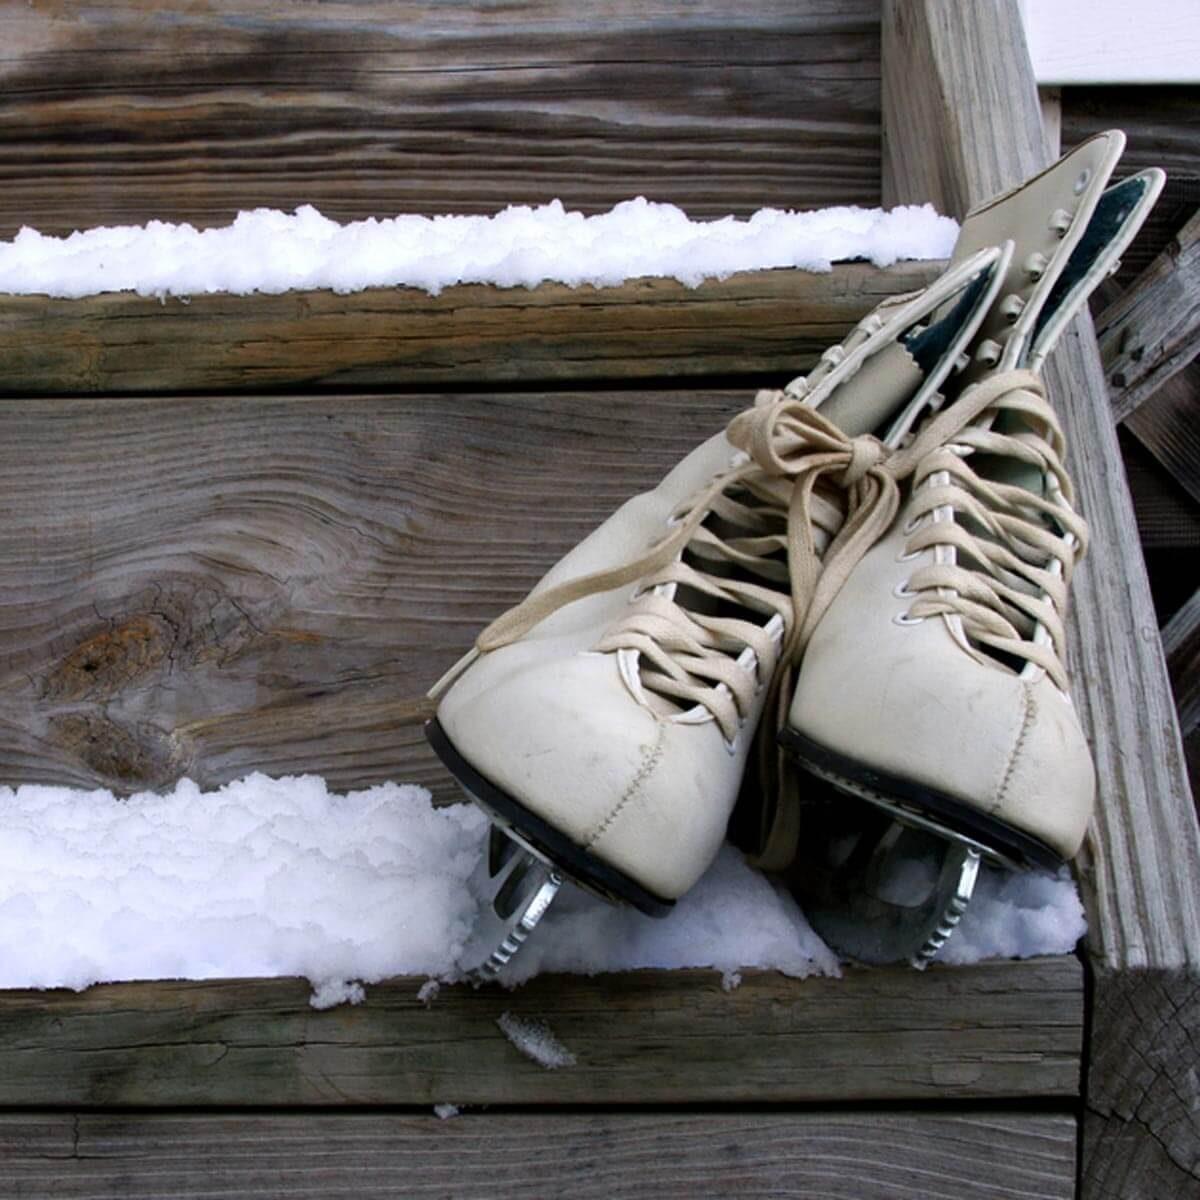 Backyard Rink Lighting: 12 Tips For Your Backyard Ice Rink